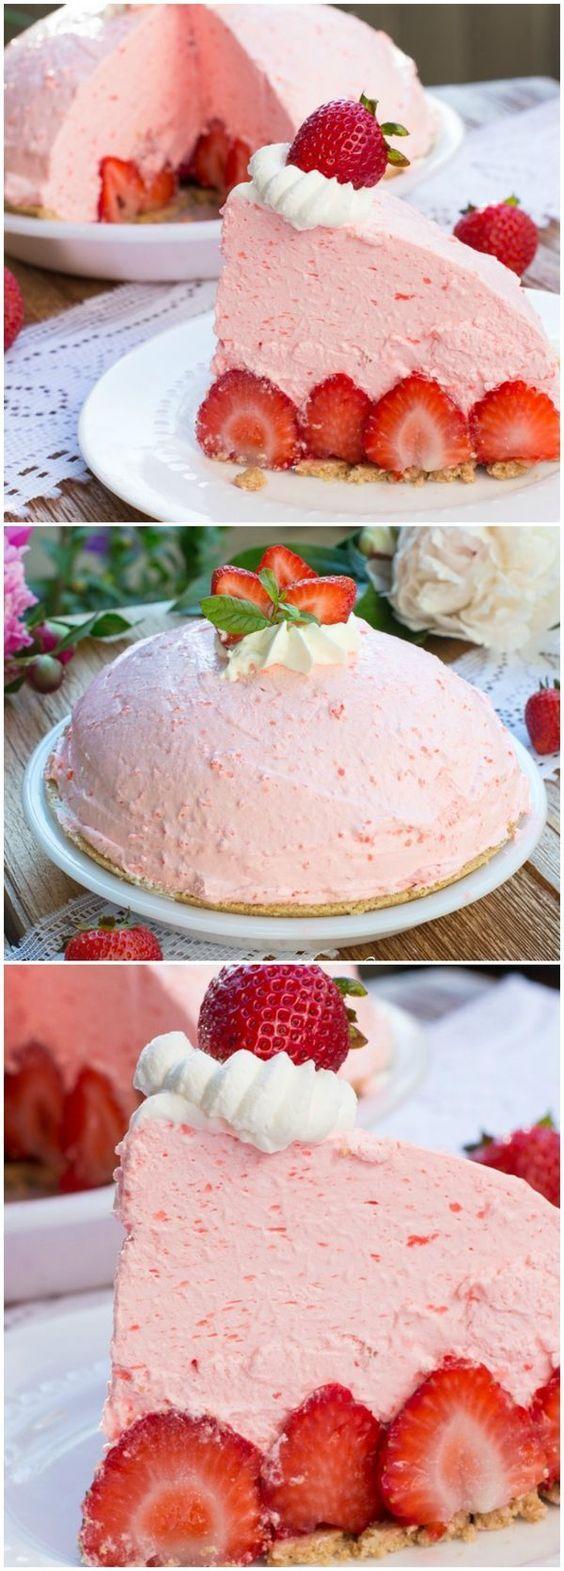 15 Strawberries, fresh. 4 cups Cool whip. 2 tbsp Granulated sugar. 1 Graham pie crust. 1 8 oz package Cream cheese.